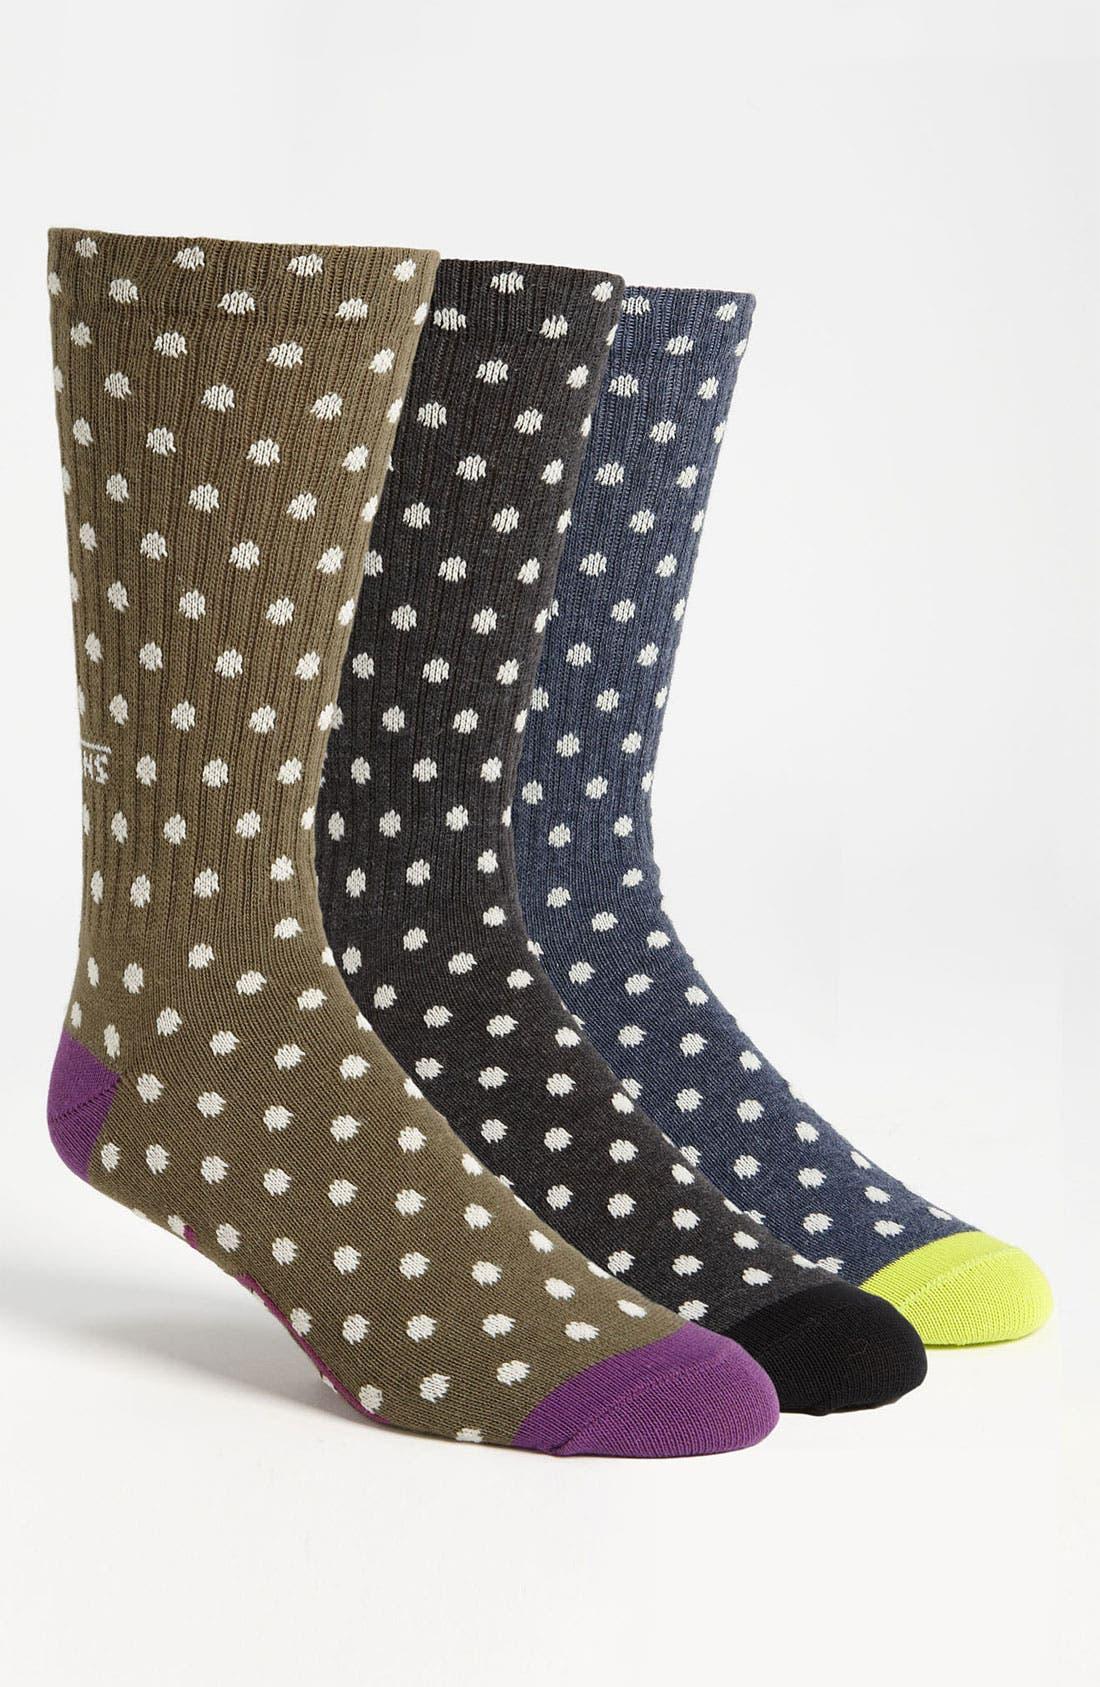 Main Image - Vans Polka Dot Crew Socks (3-Pack)